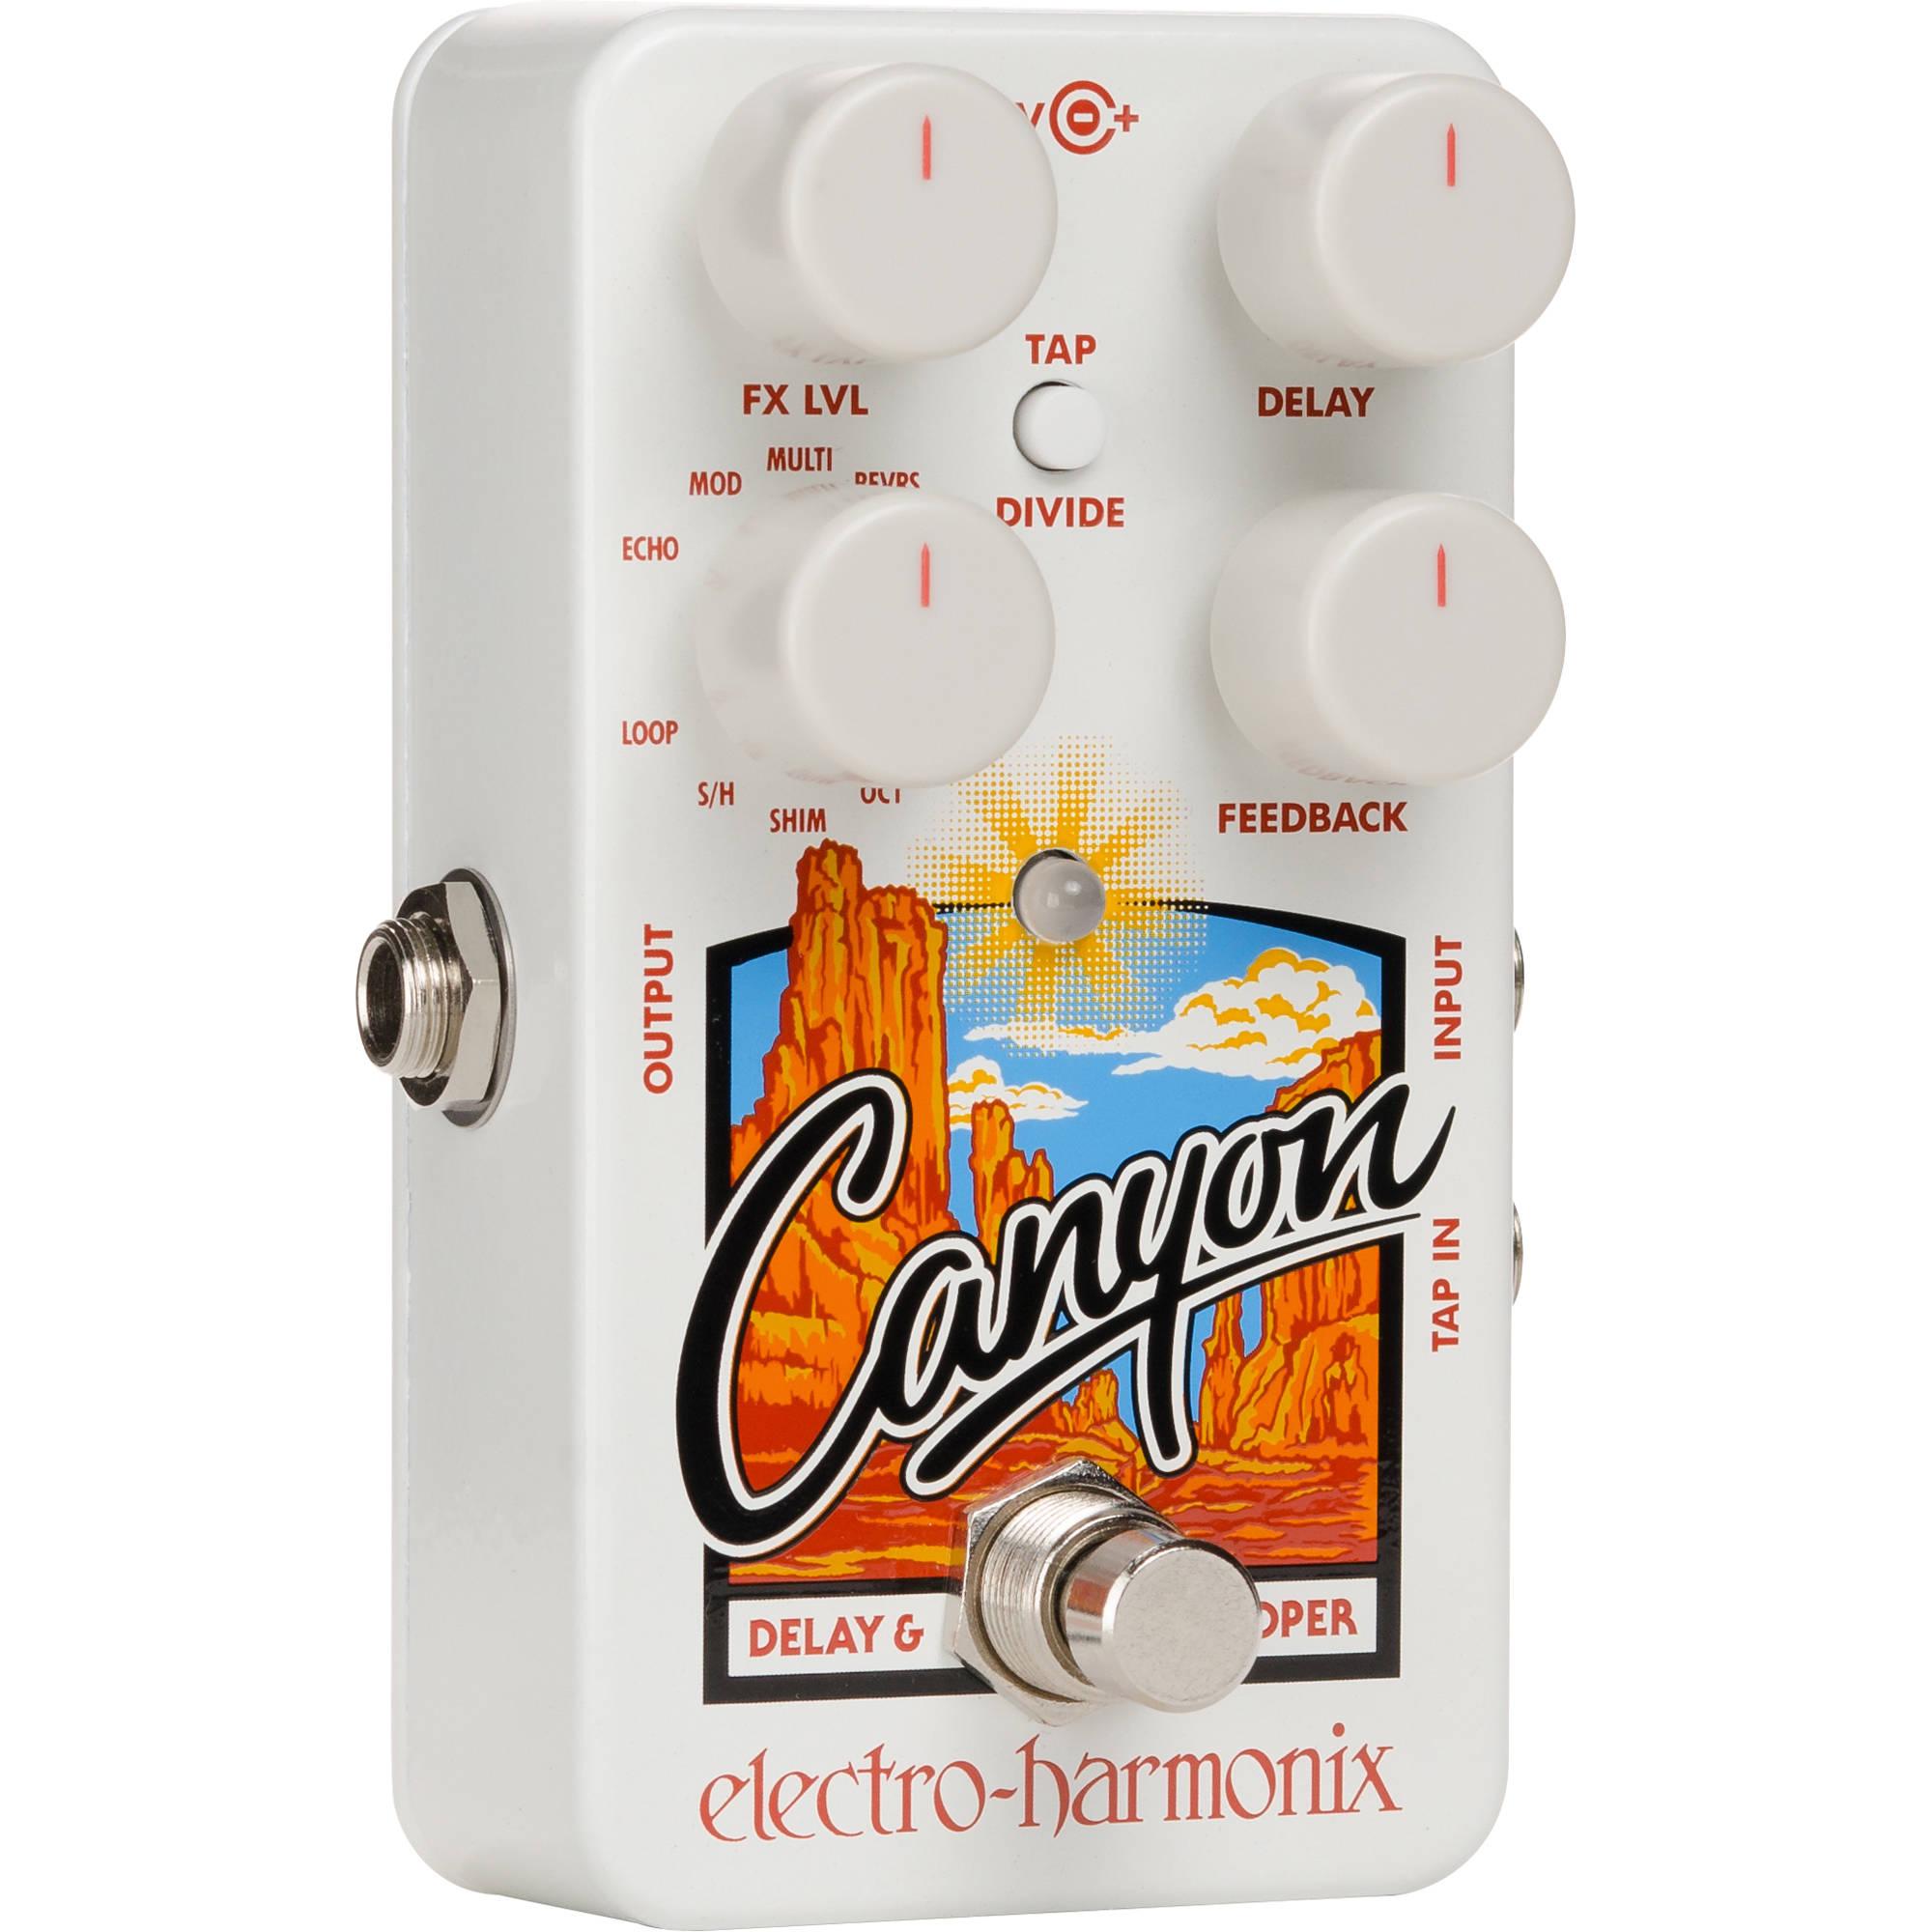 canyon delay  Electro-Harmonix Canyon Delay and Looper Pedal with 11 CANYON